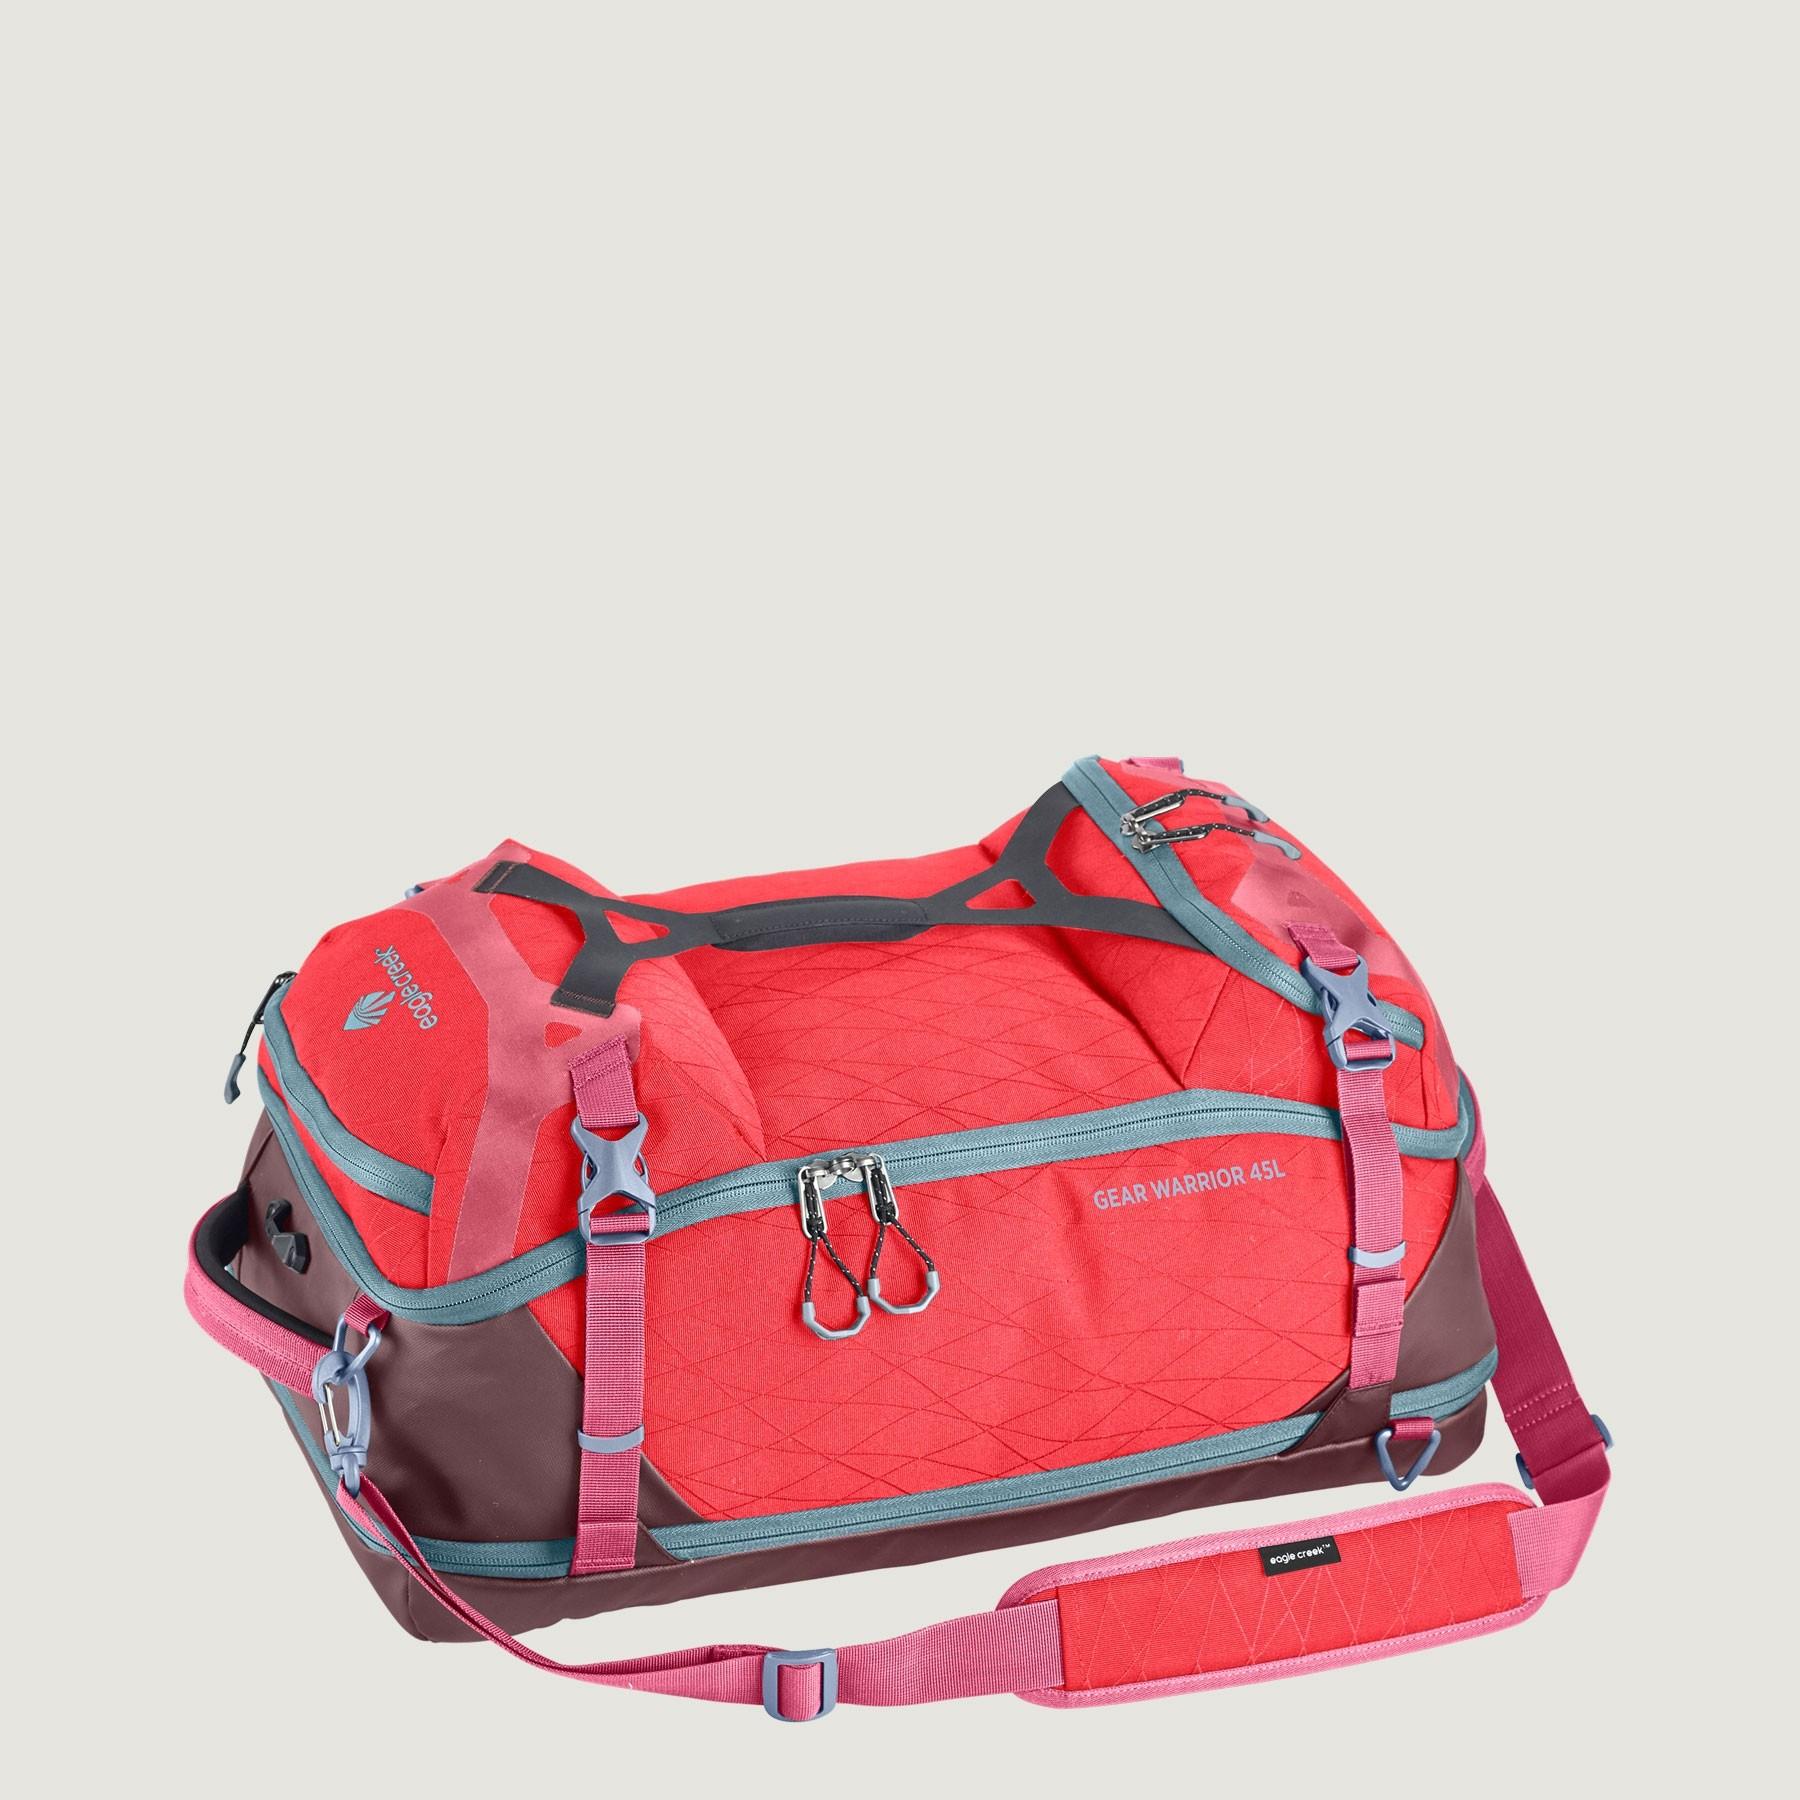 c0163d91ea28 Gear Warrior Travel Pack 45L